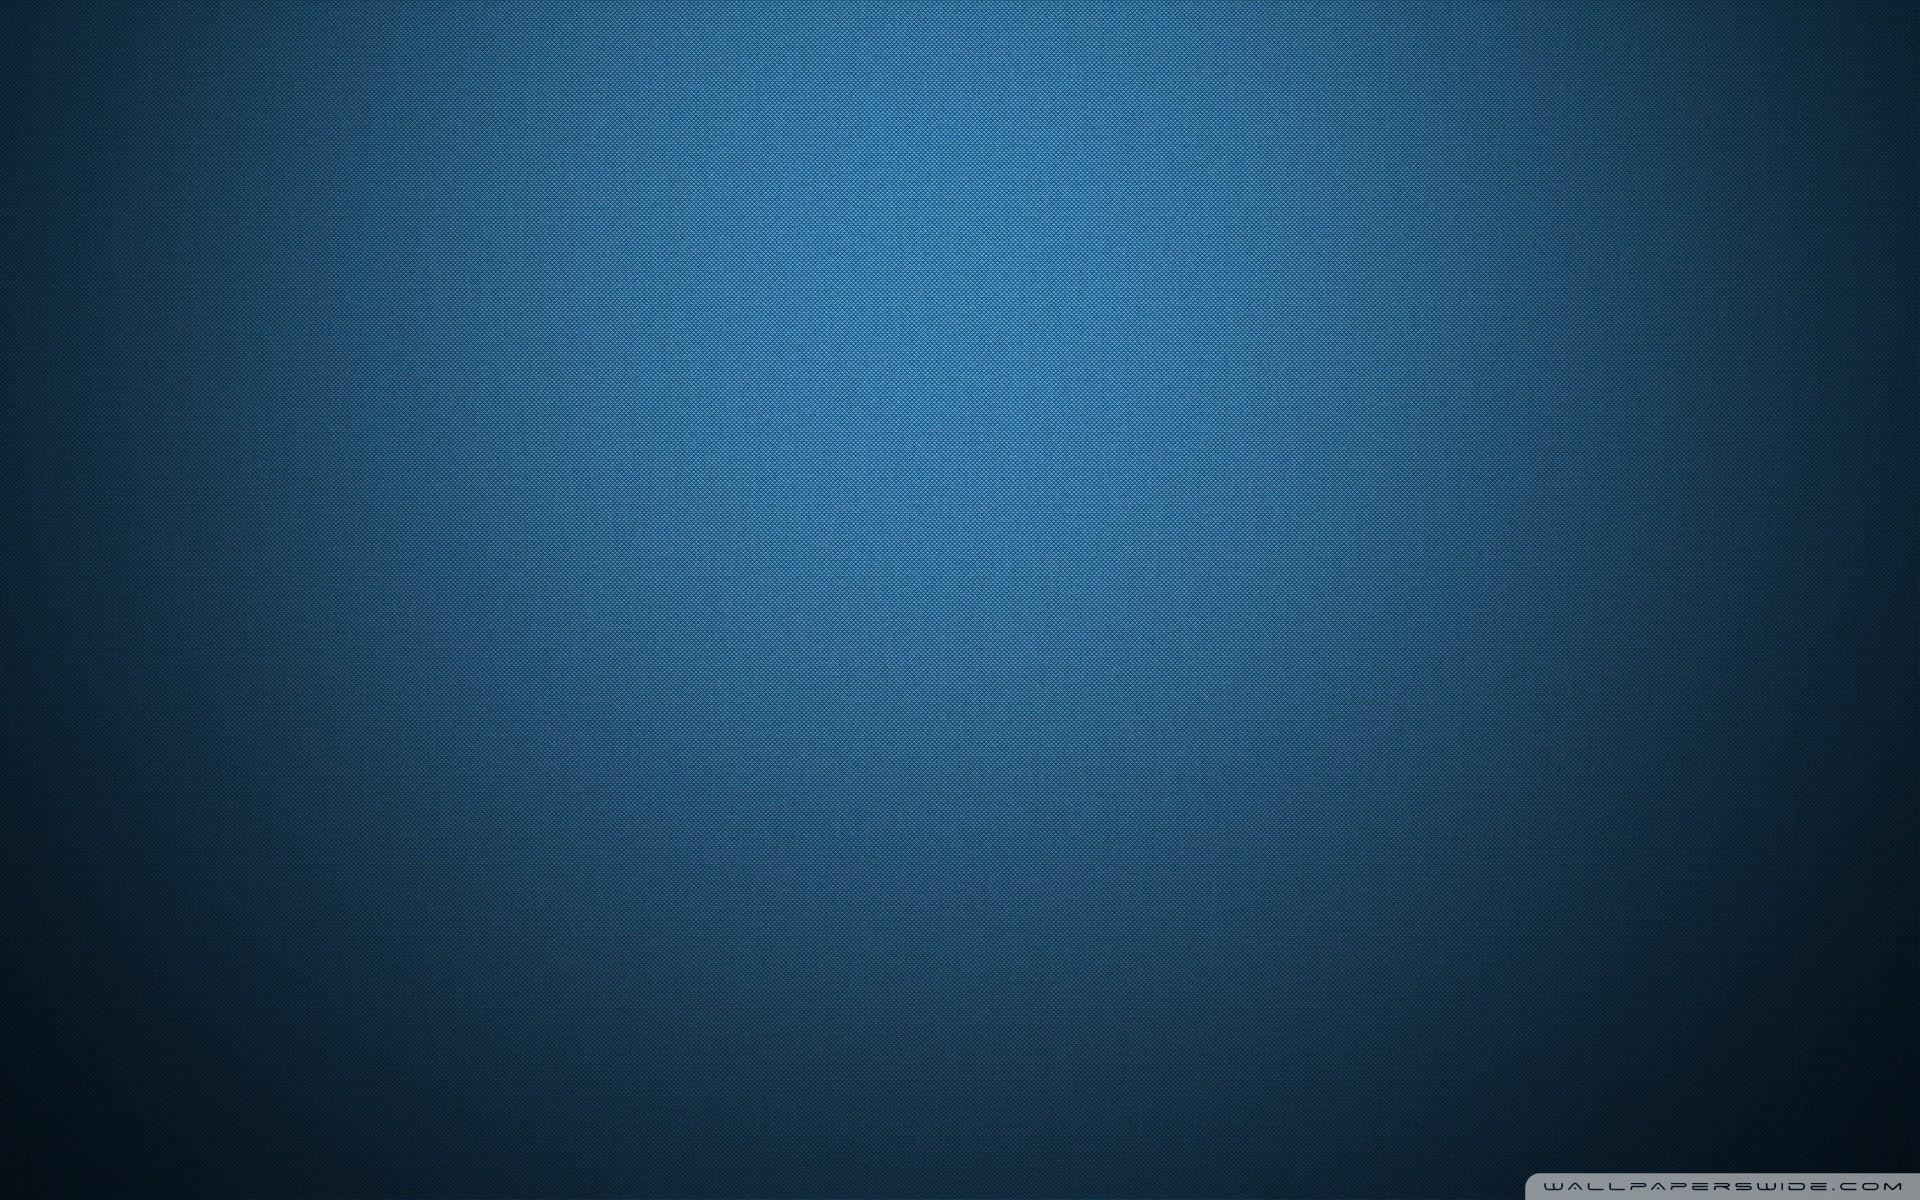 Universe Wallpaper Hd Dark Blue Backgrounds 183 ①